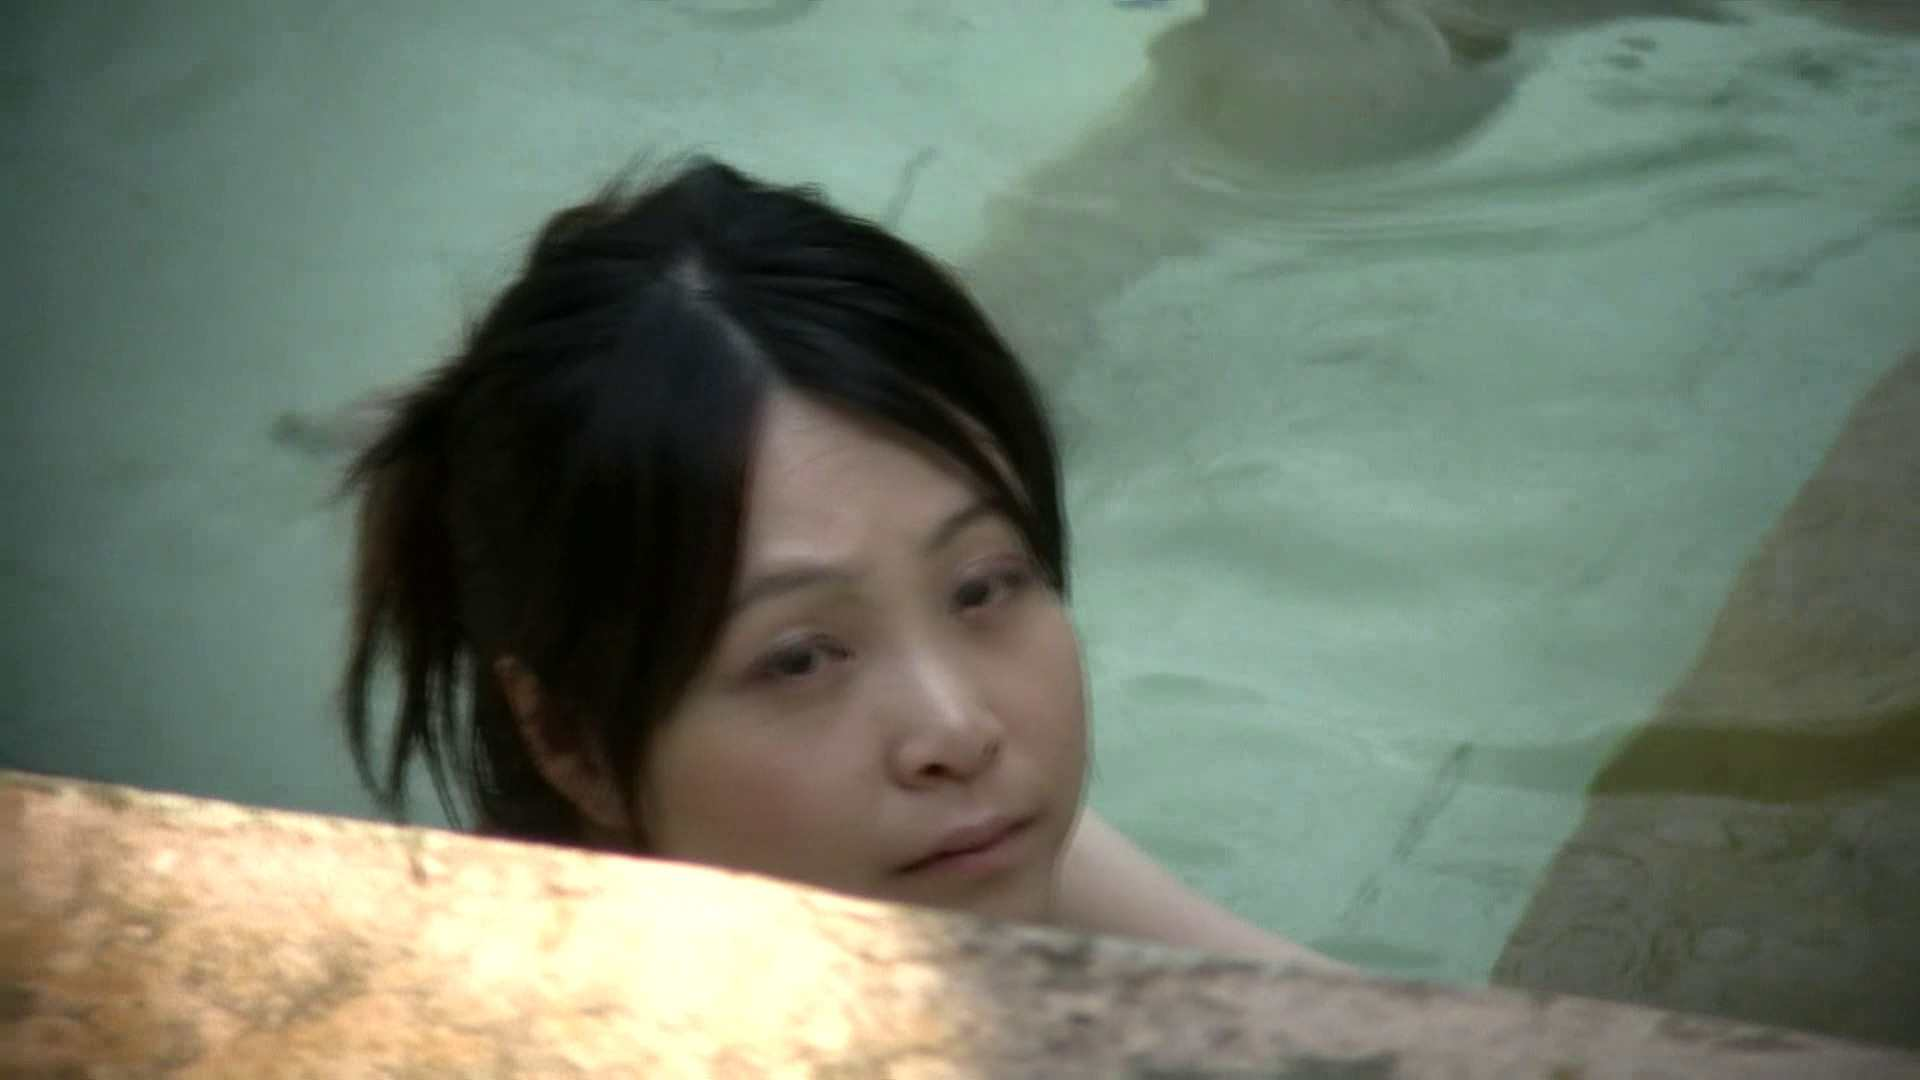 Aquaな露天風呂Vol.652 盗撮 | HなOL  105pic 11